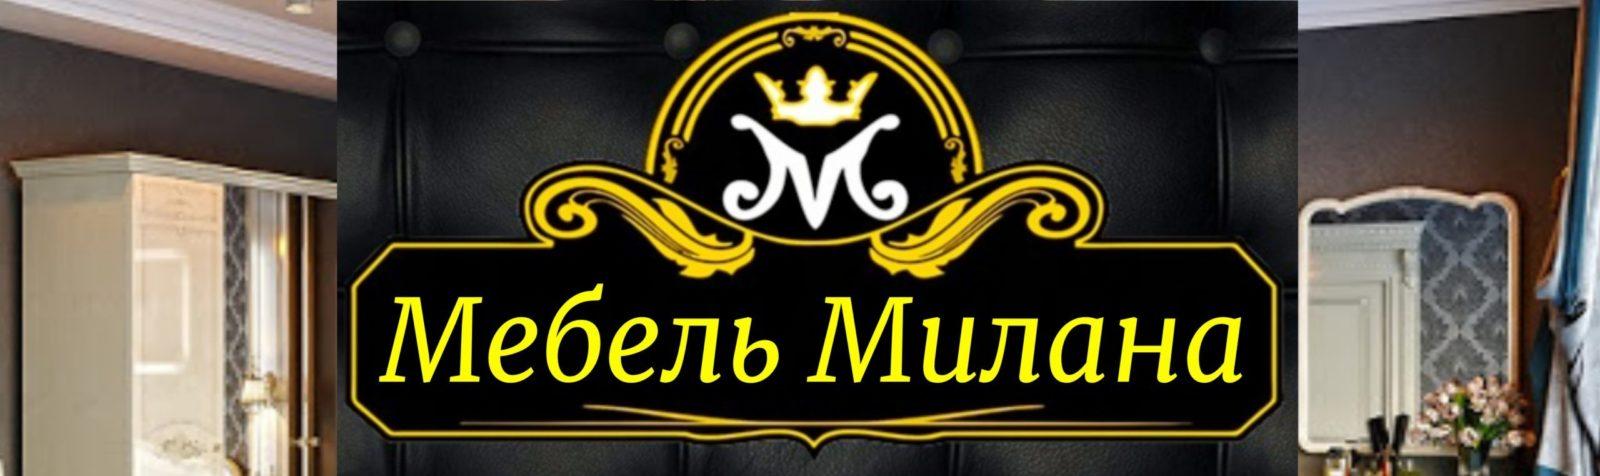 Интернет Магазин Мебели Милана Заказ без предоплаты!